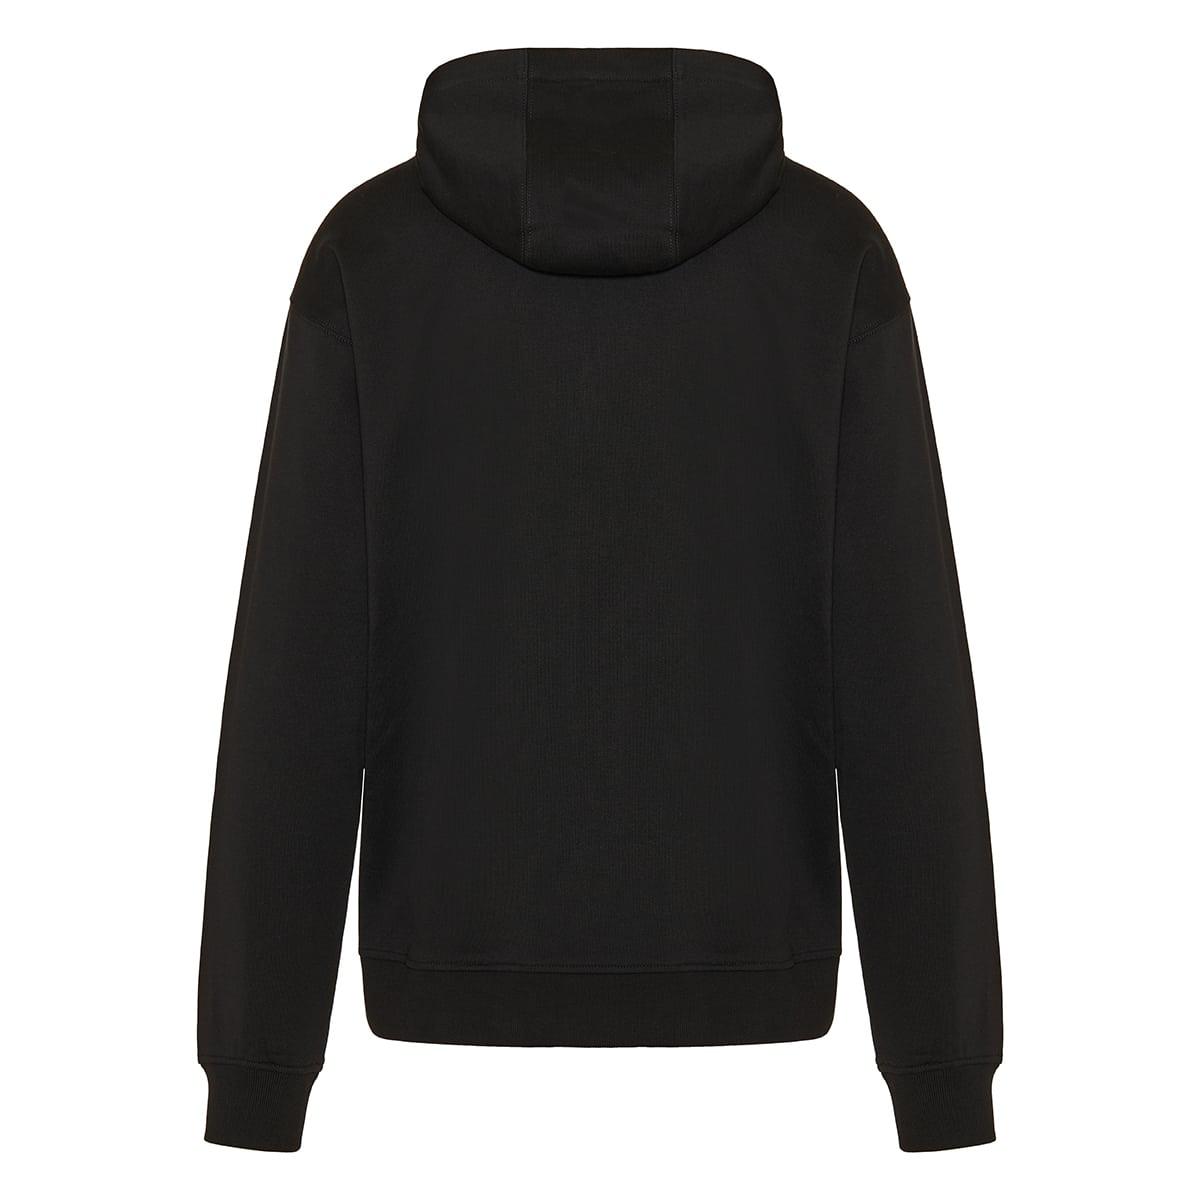 La Greca logo zipper hoodie